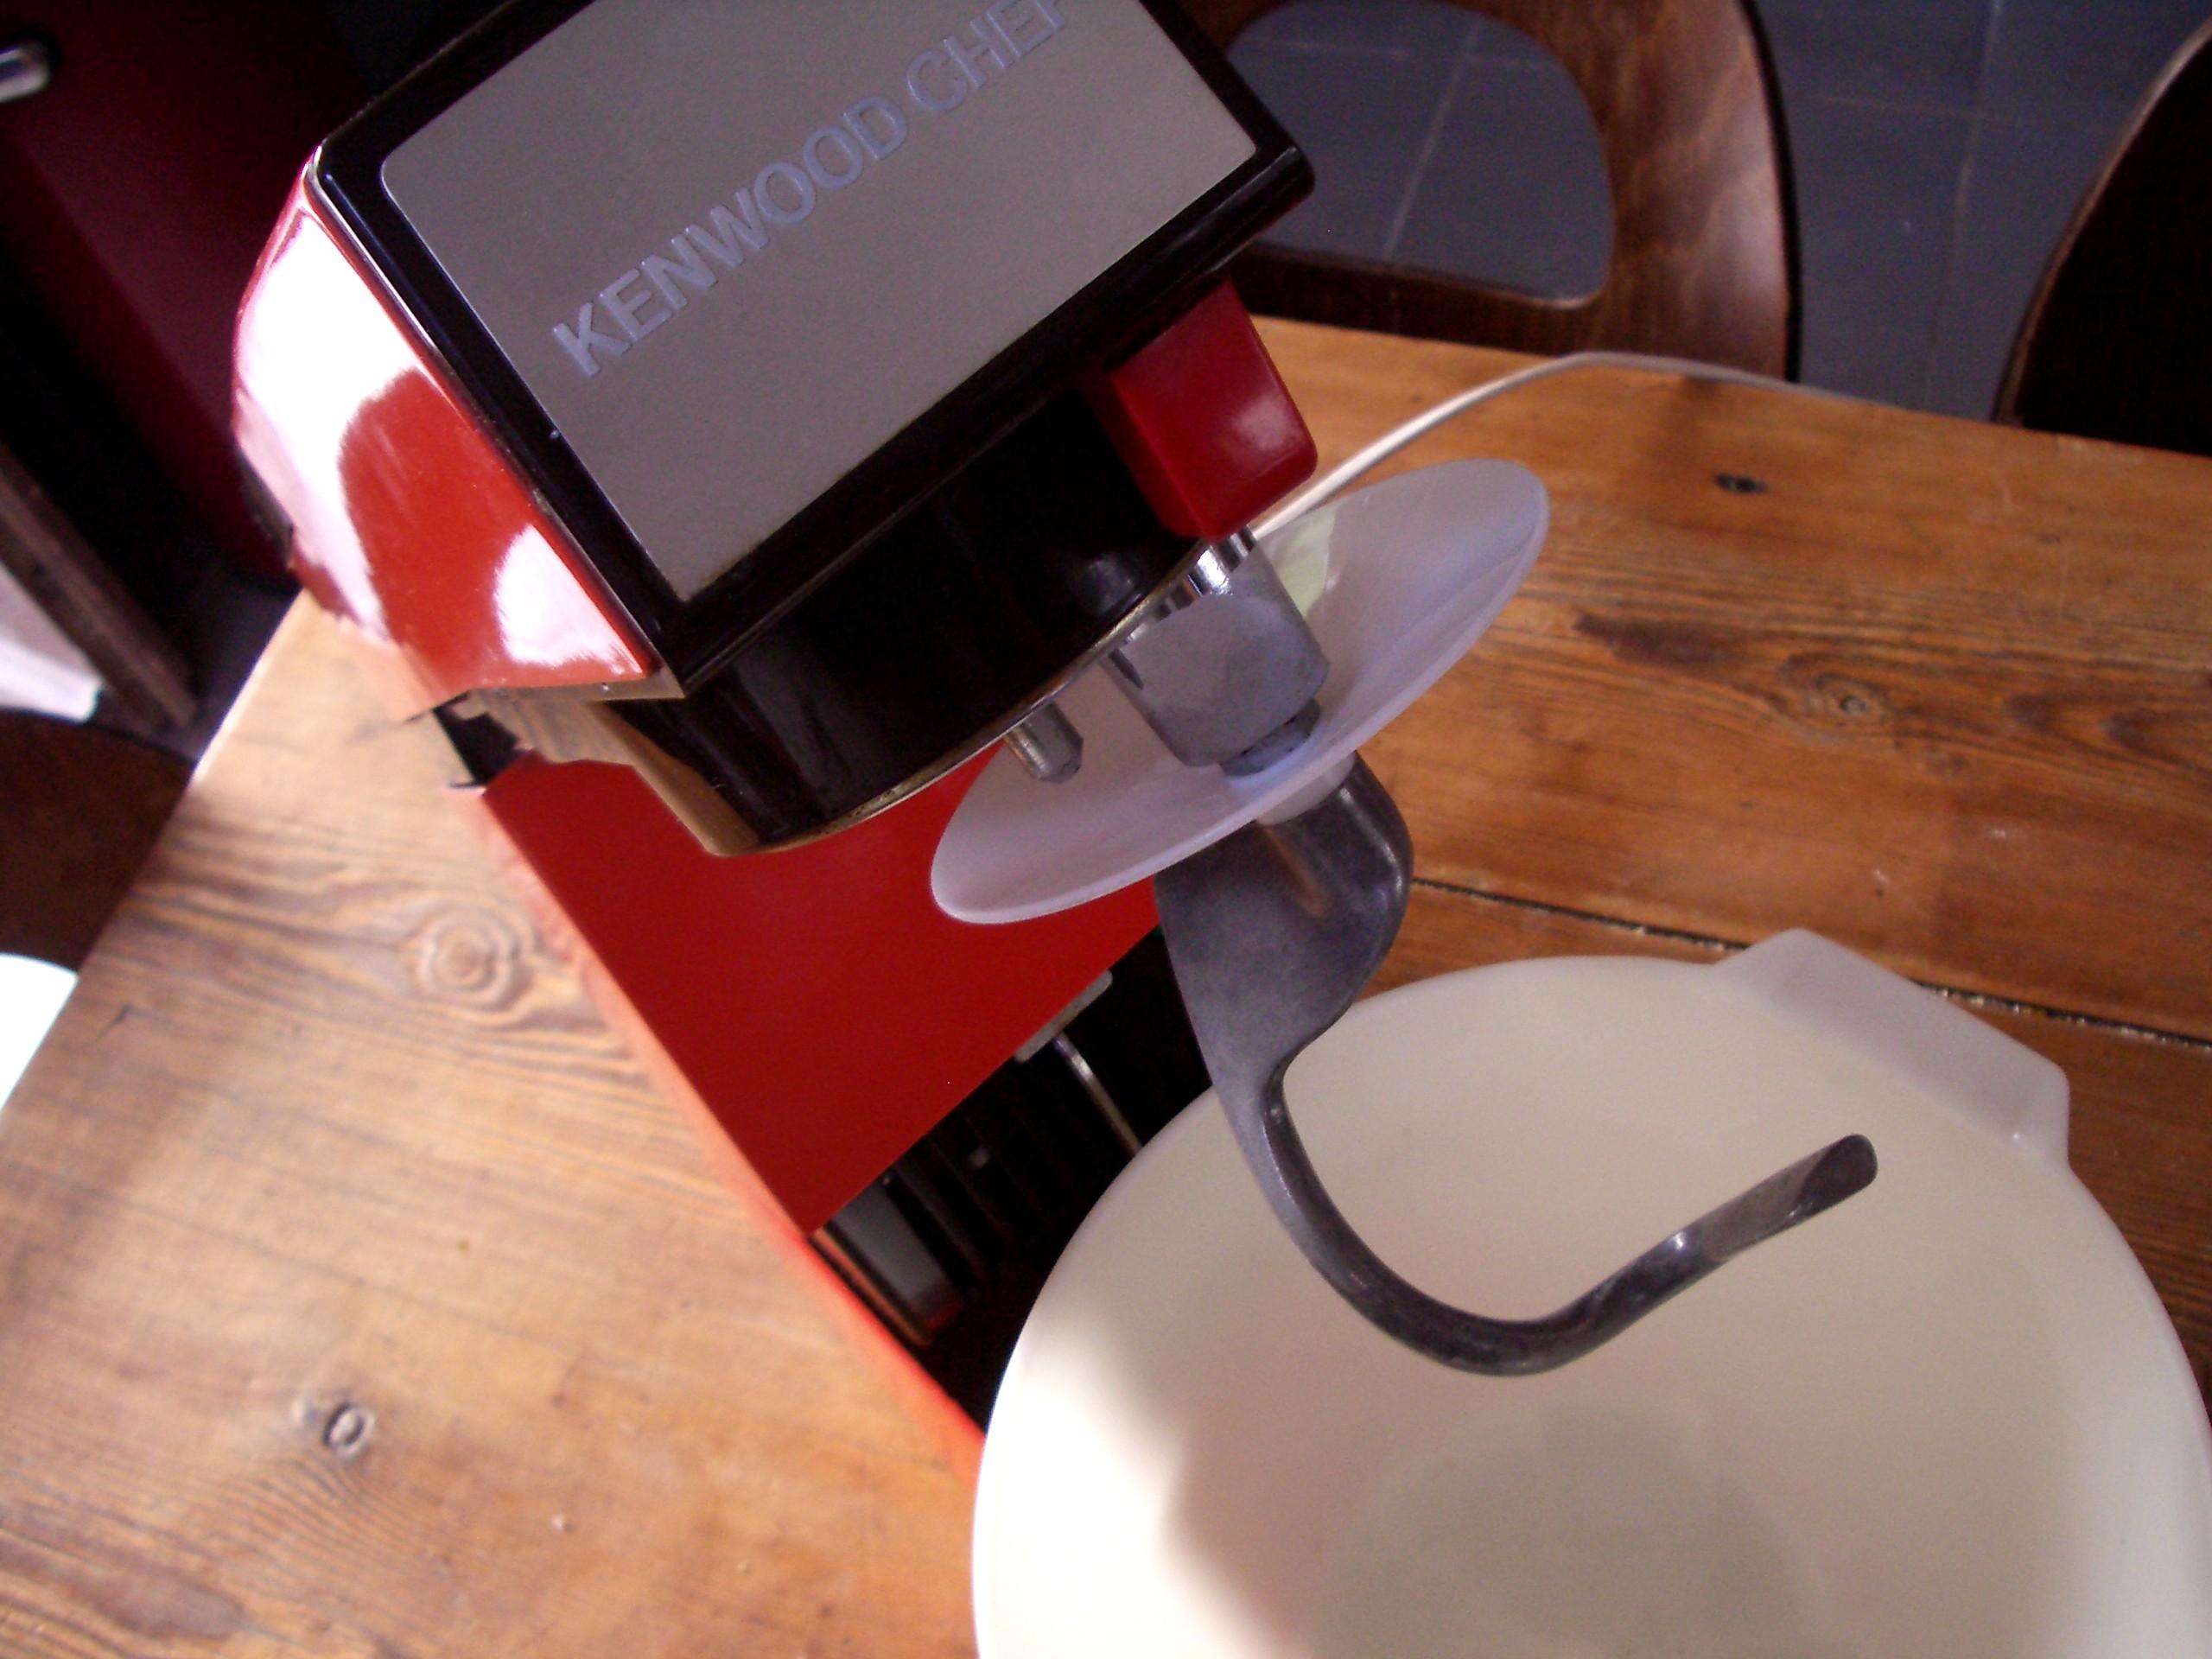 robot cuisine multifiction petrin kenwood chef a 901. Black Bedroom Furniture Sets. Home Design Ideas